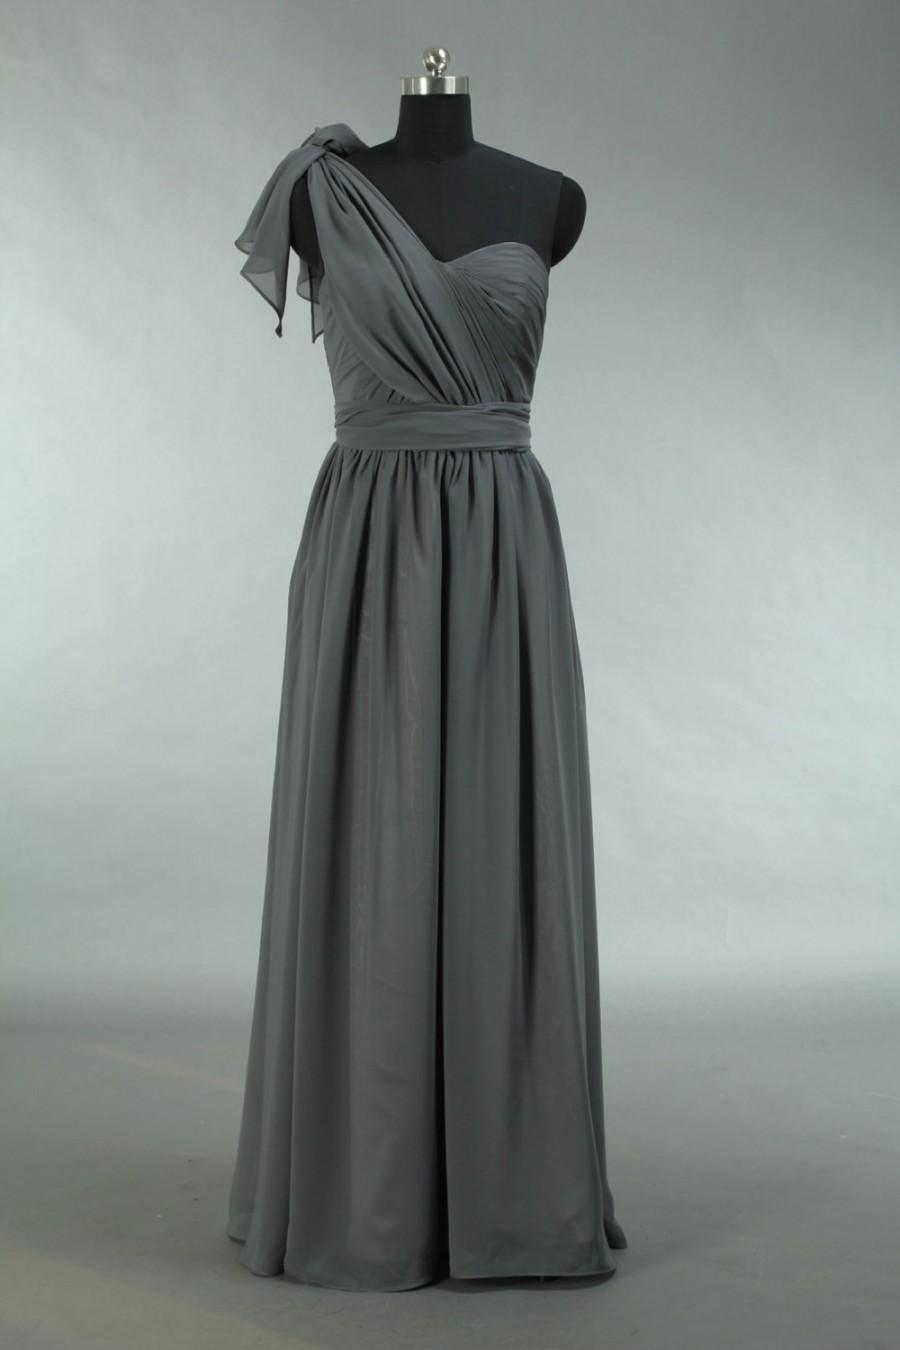 Nozze - Cheap Grey Prom Dress, Long Convertible Chiffon Prom Dress 2015